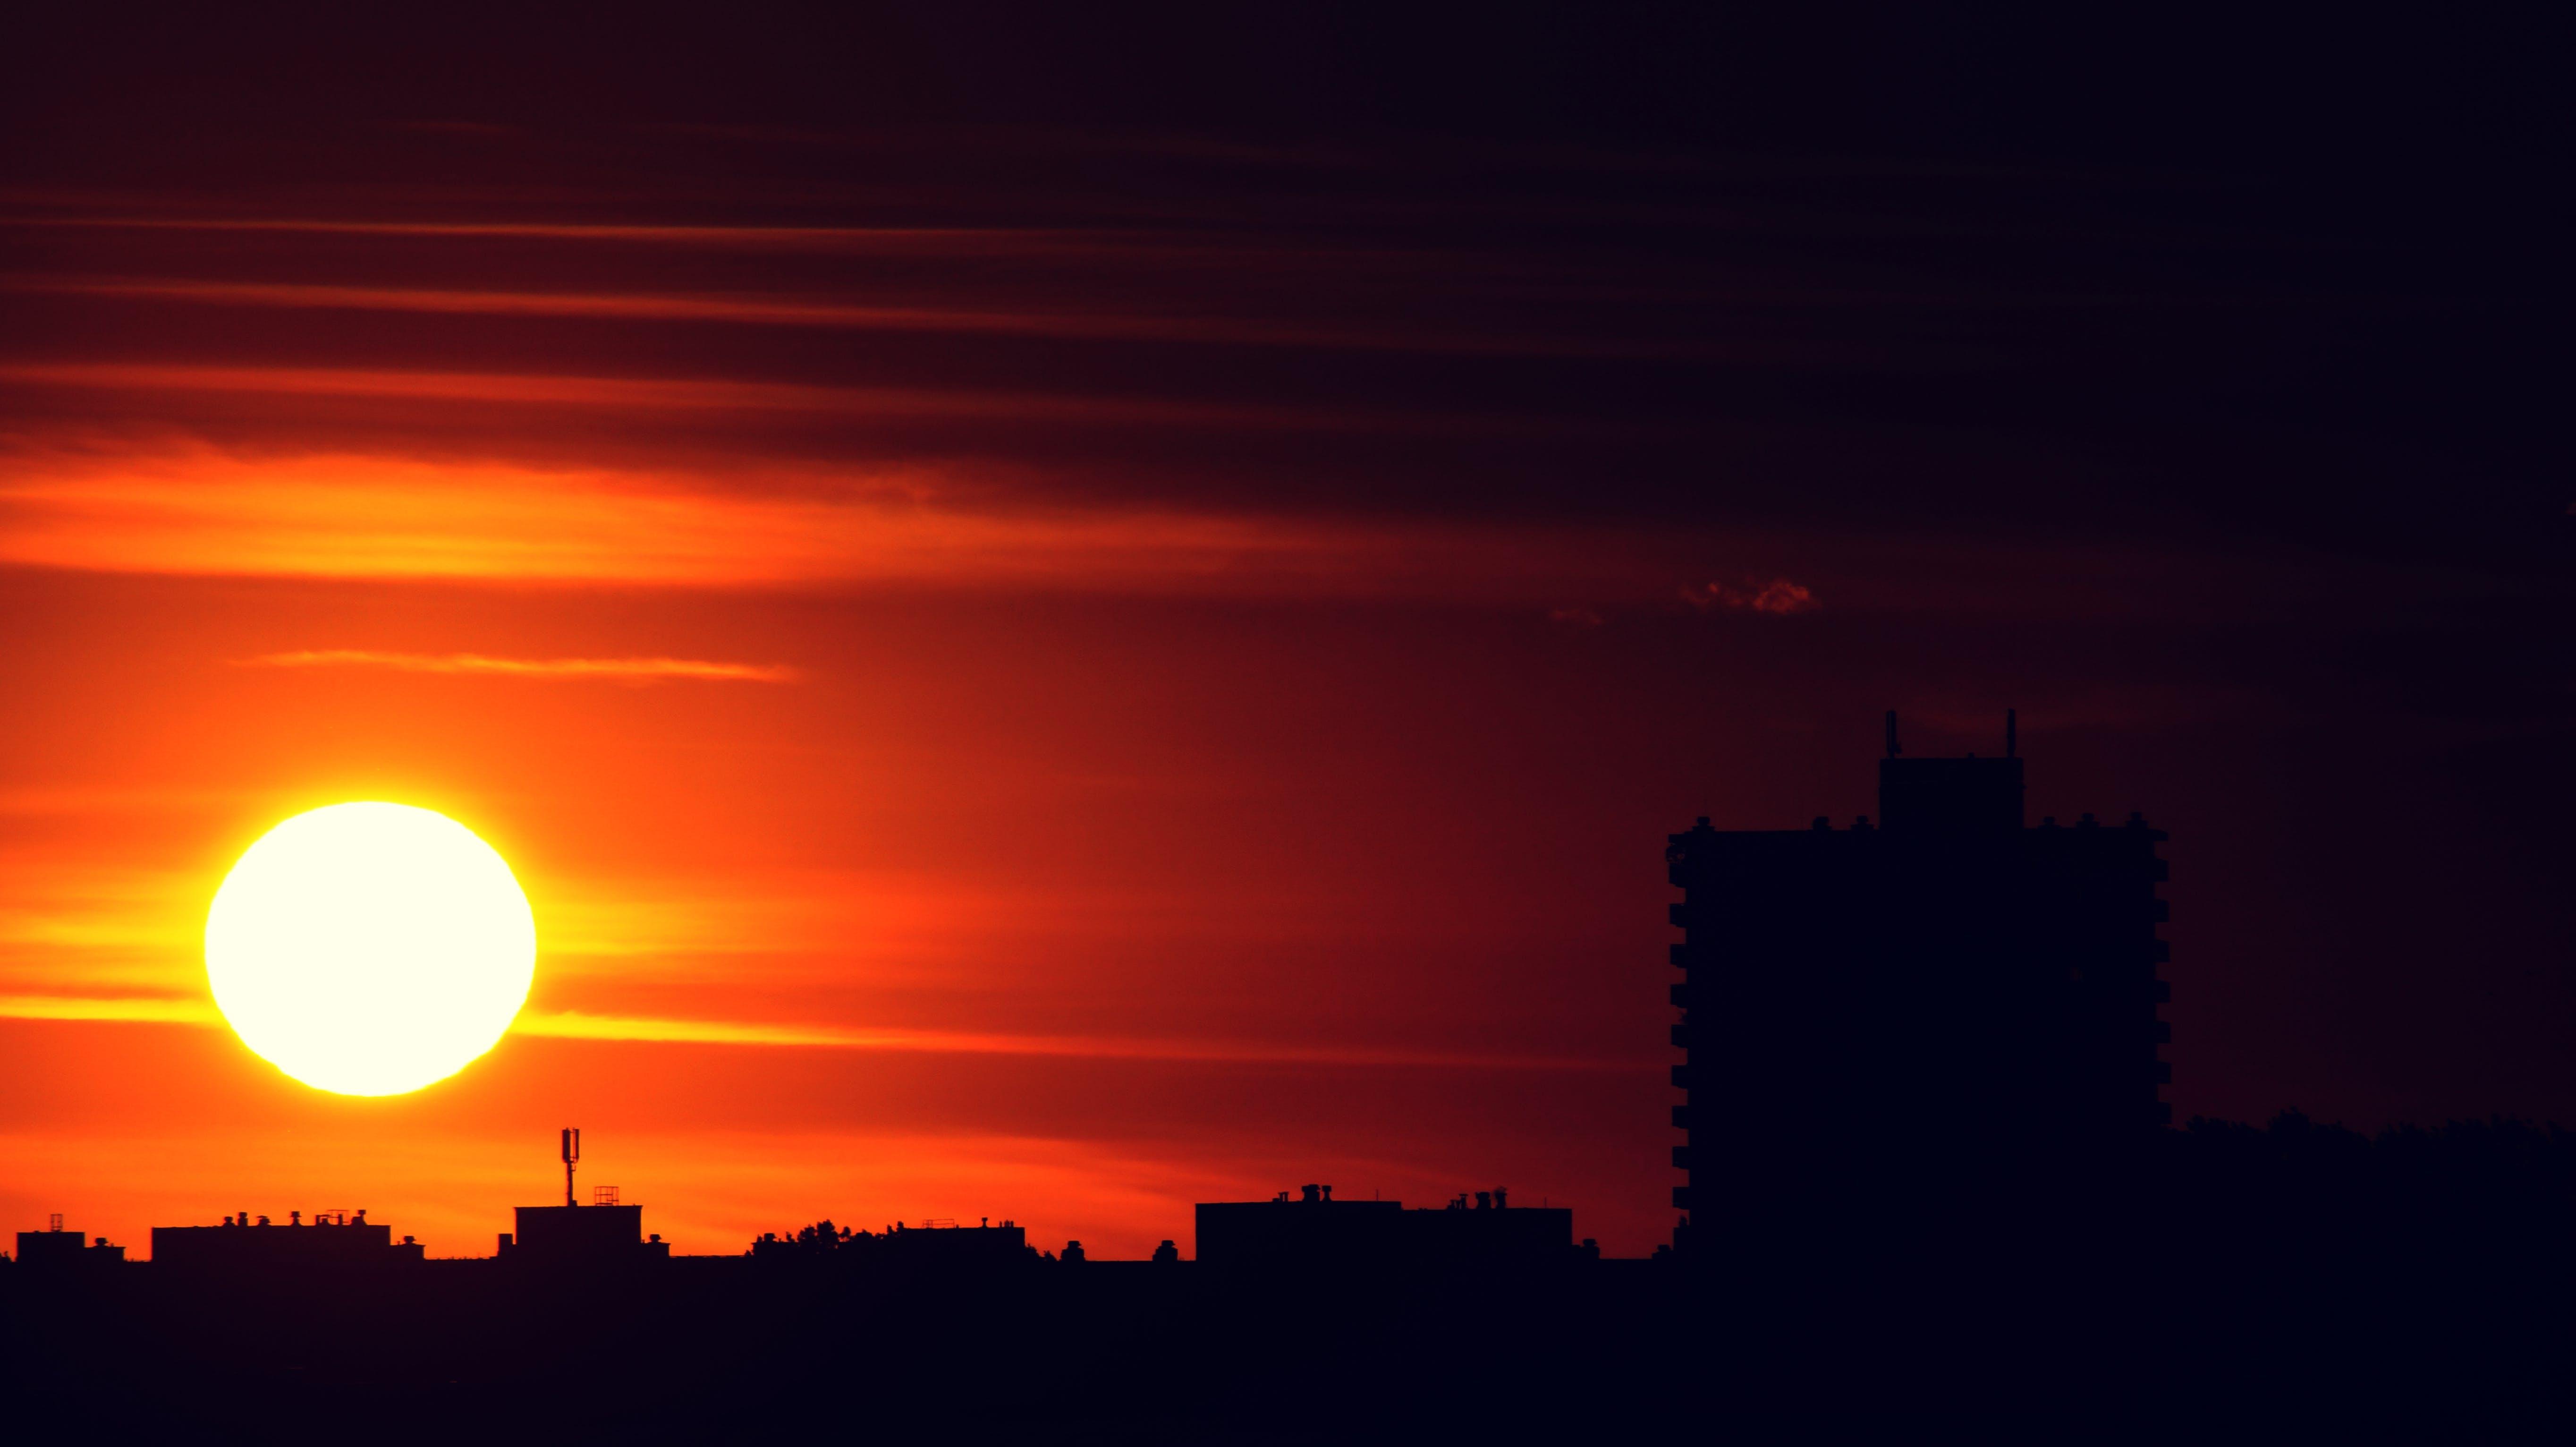 backlit, buildings, clouds